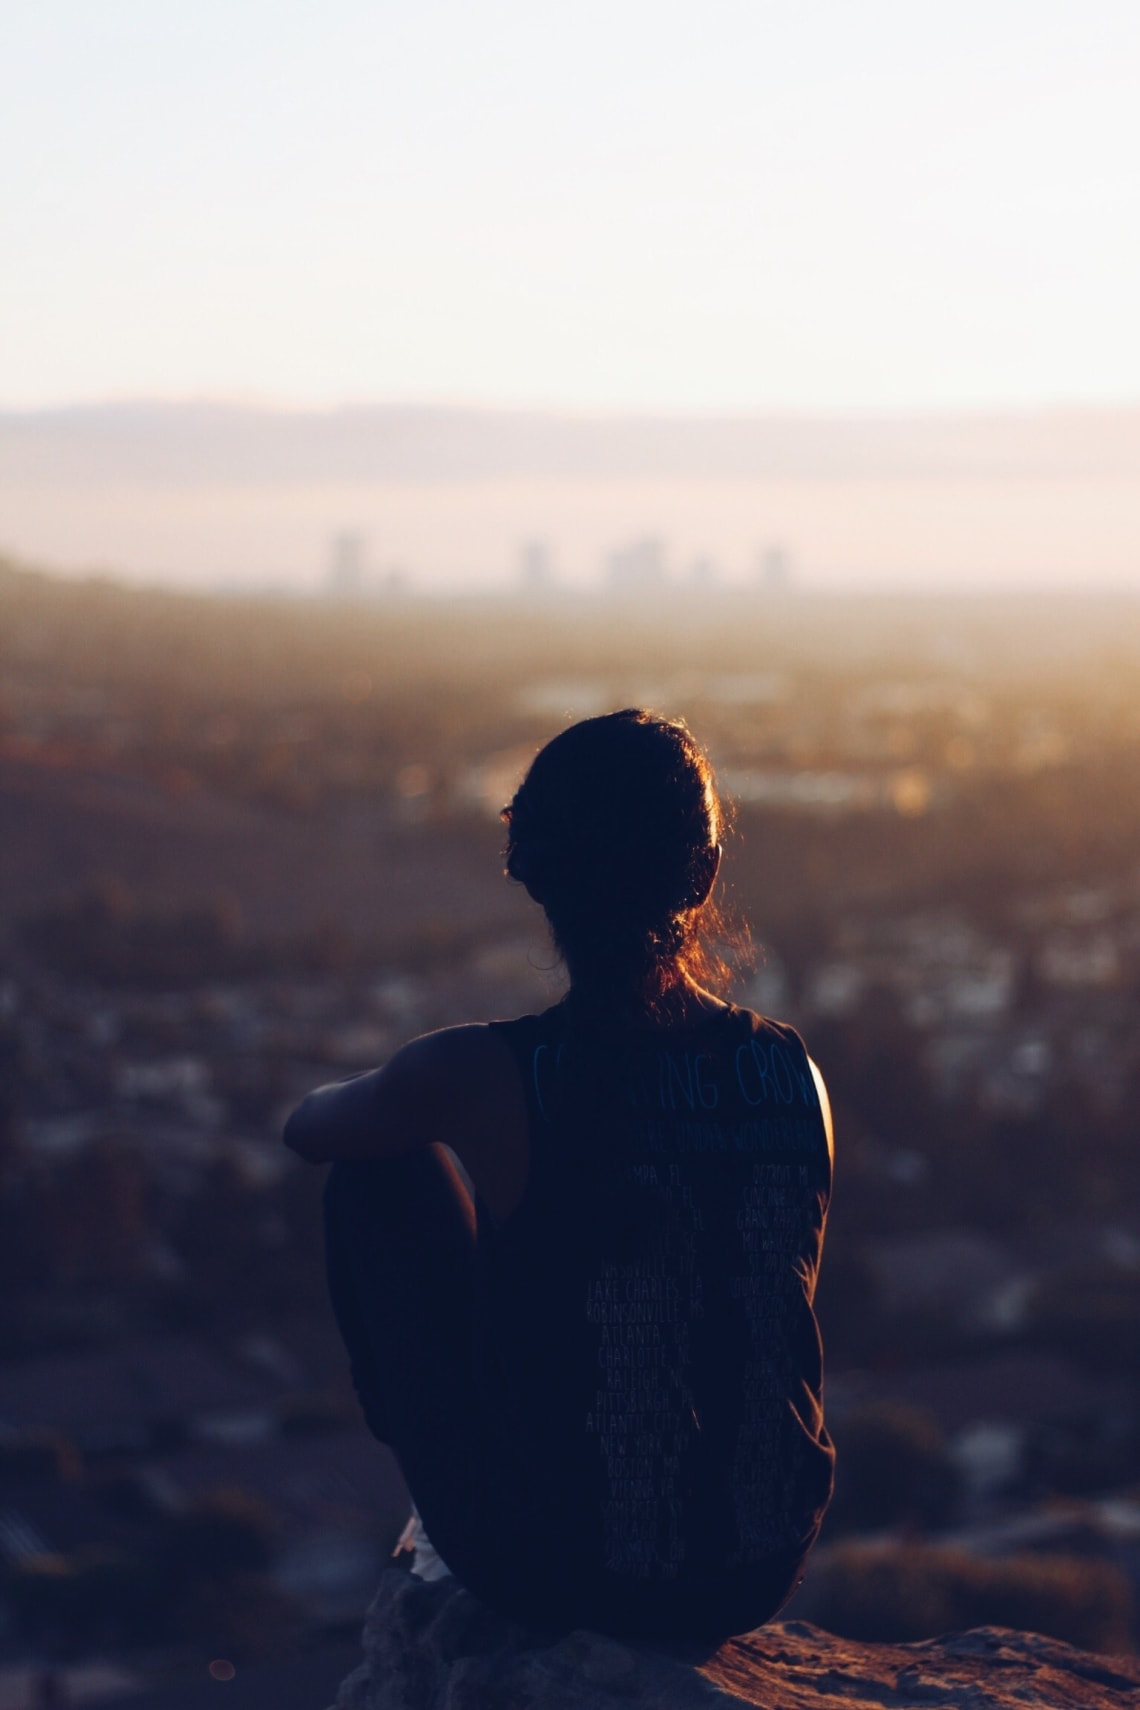 Solo female traveler enjoying a beautiful sunset from an overlook